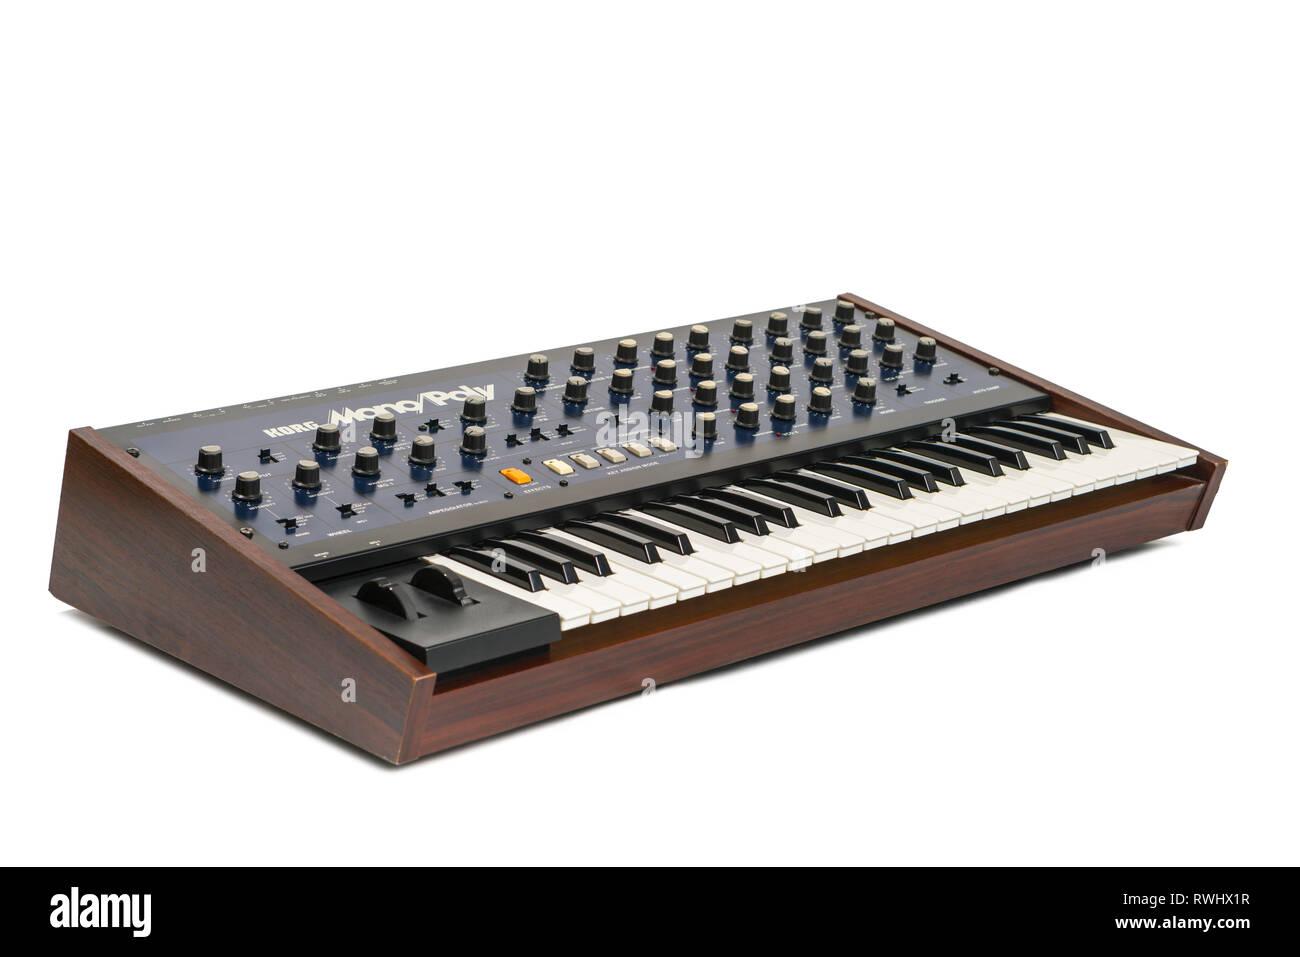 Korg Monopoly vintage analog synthesizer from 1981 and white studio background. - Stock Image